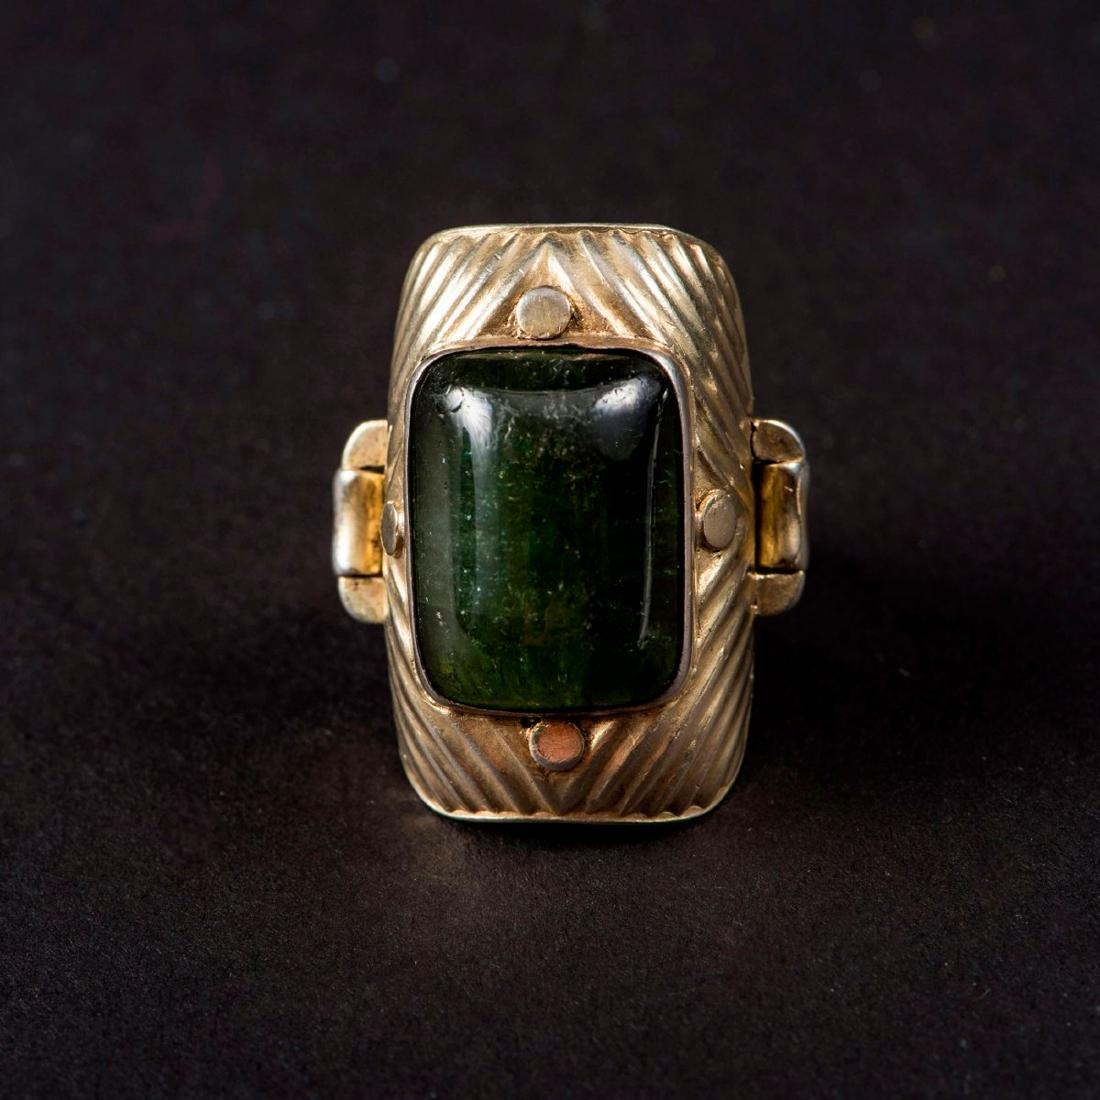 Ring, c. 1950 - 2